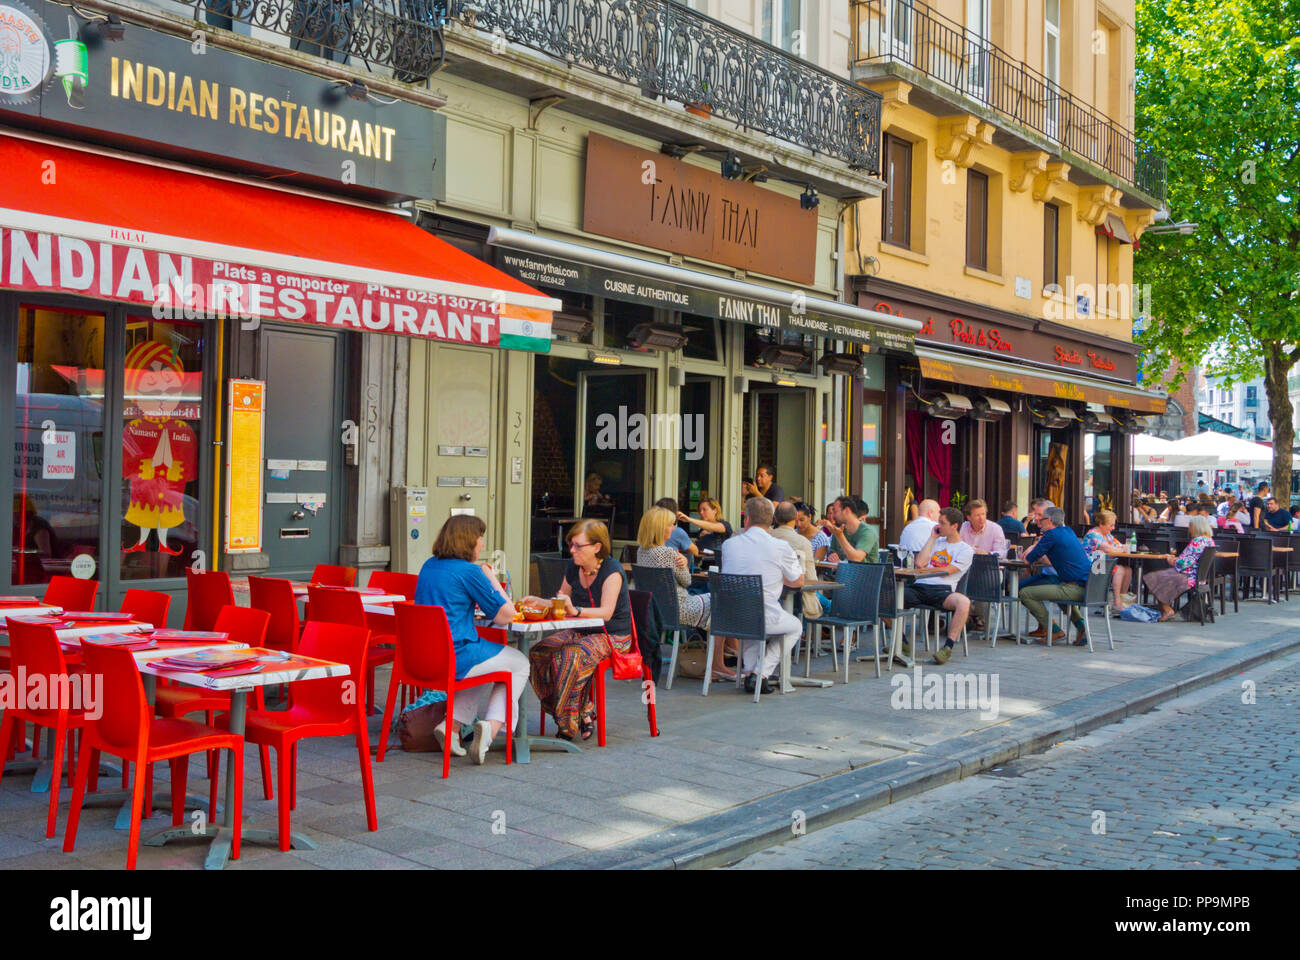 Restaurants, Rue Jules Van Praet, at Place Saint-Gery, Brussels, Belgium - Stock Image